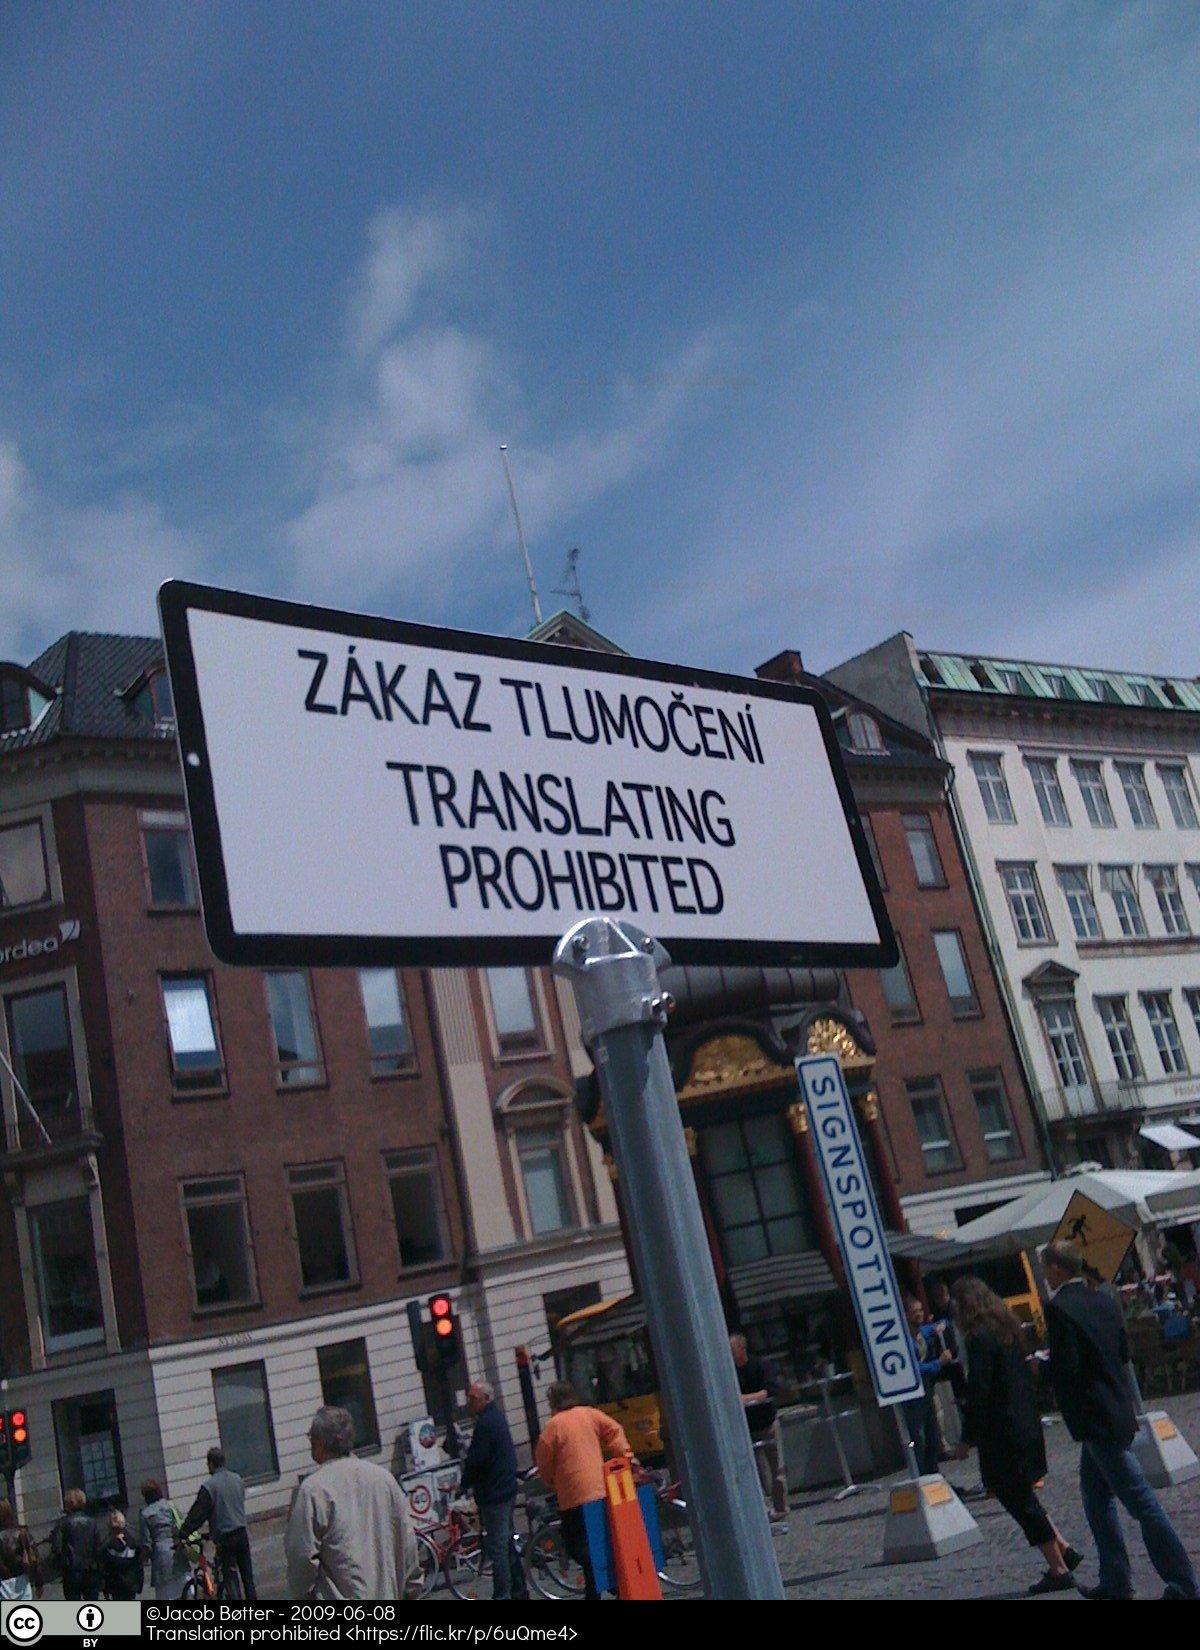 Road sign prohibiting translation